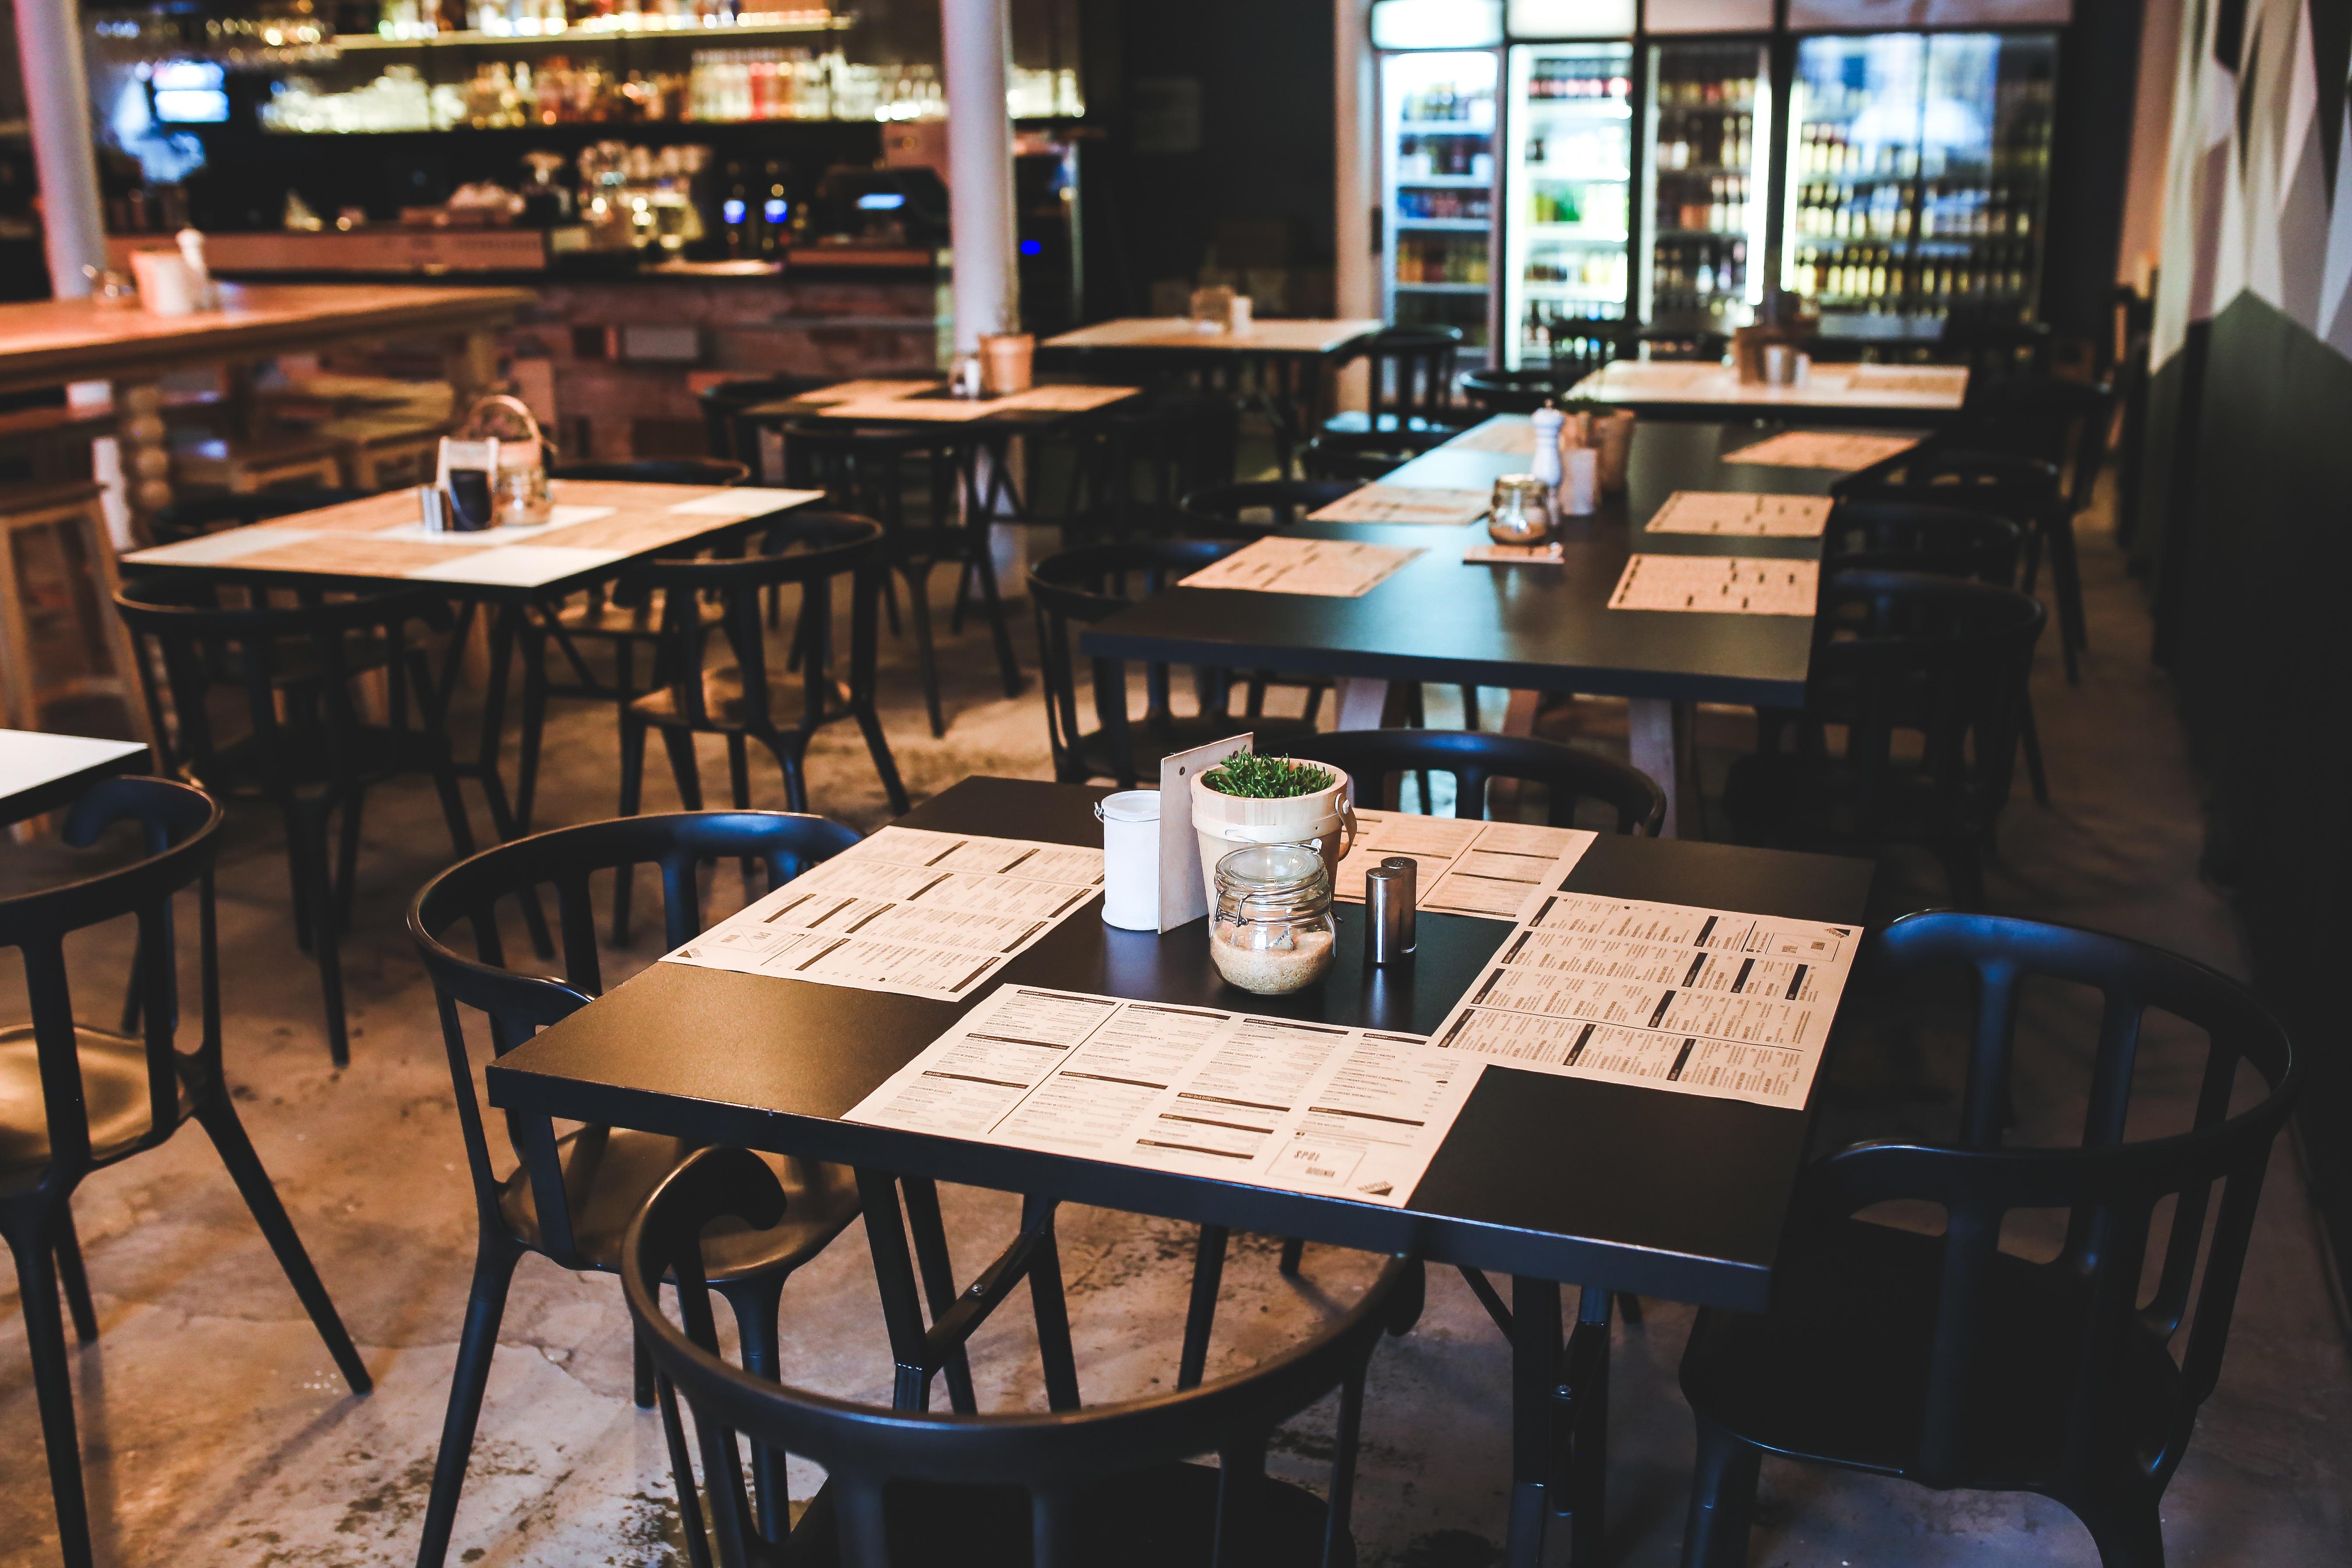 Gambar Meja Vintage Retro Kursi Pedalaman Restoran Bar Menu